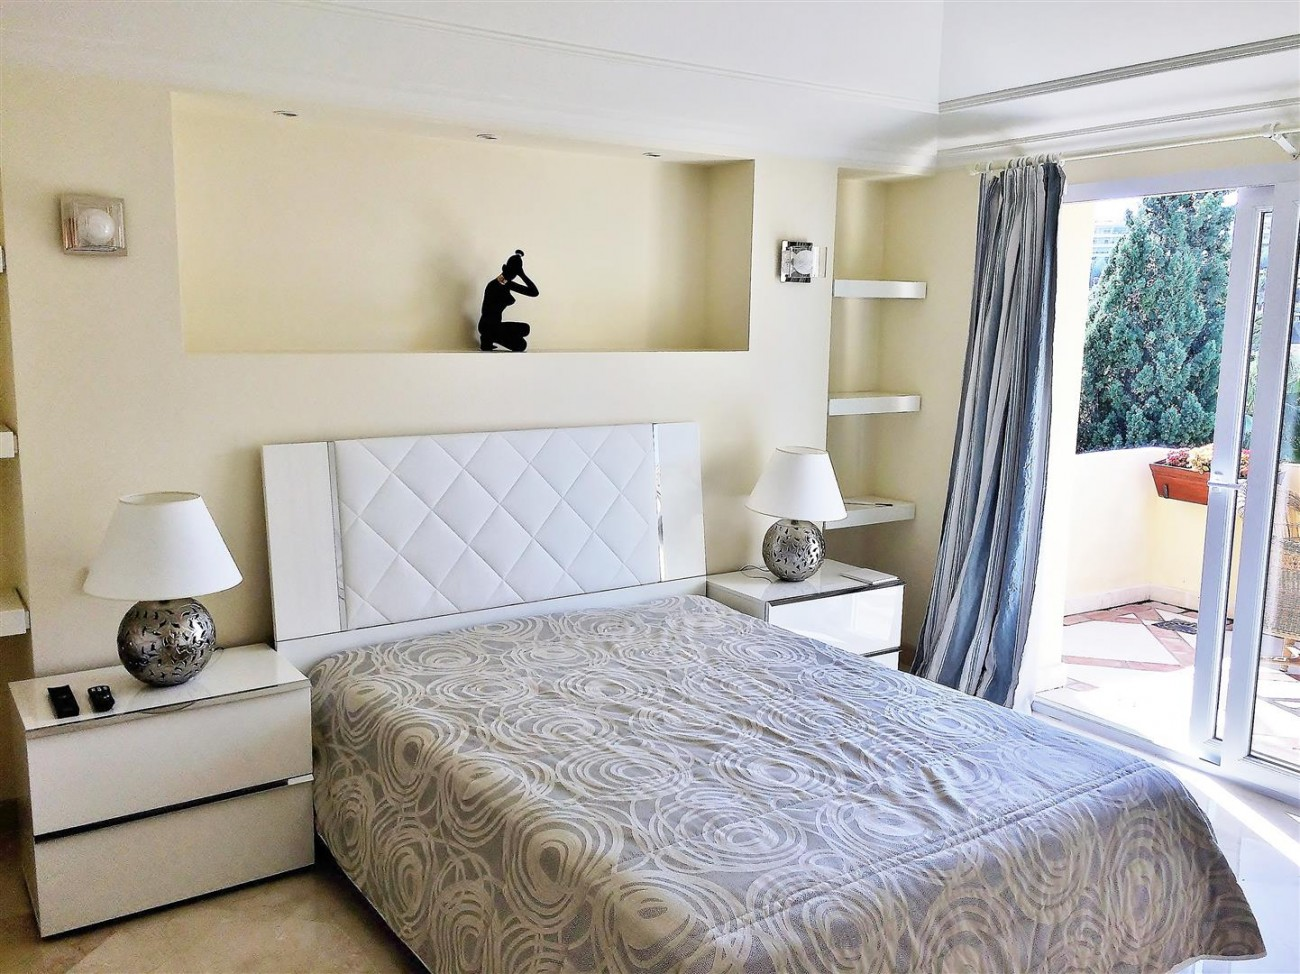 Penthouse for sale Las Alamandas Nueva Andalucia Marbella Spain (34) (Large)